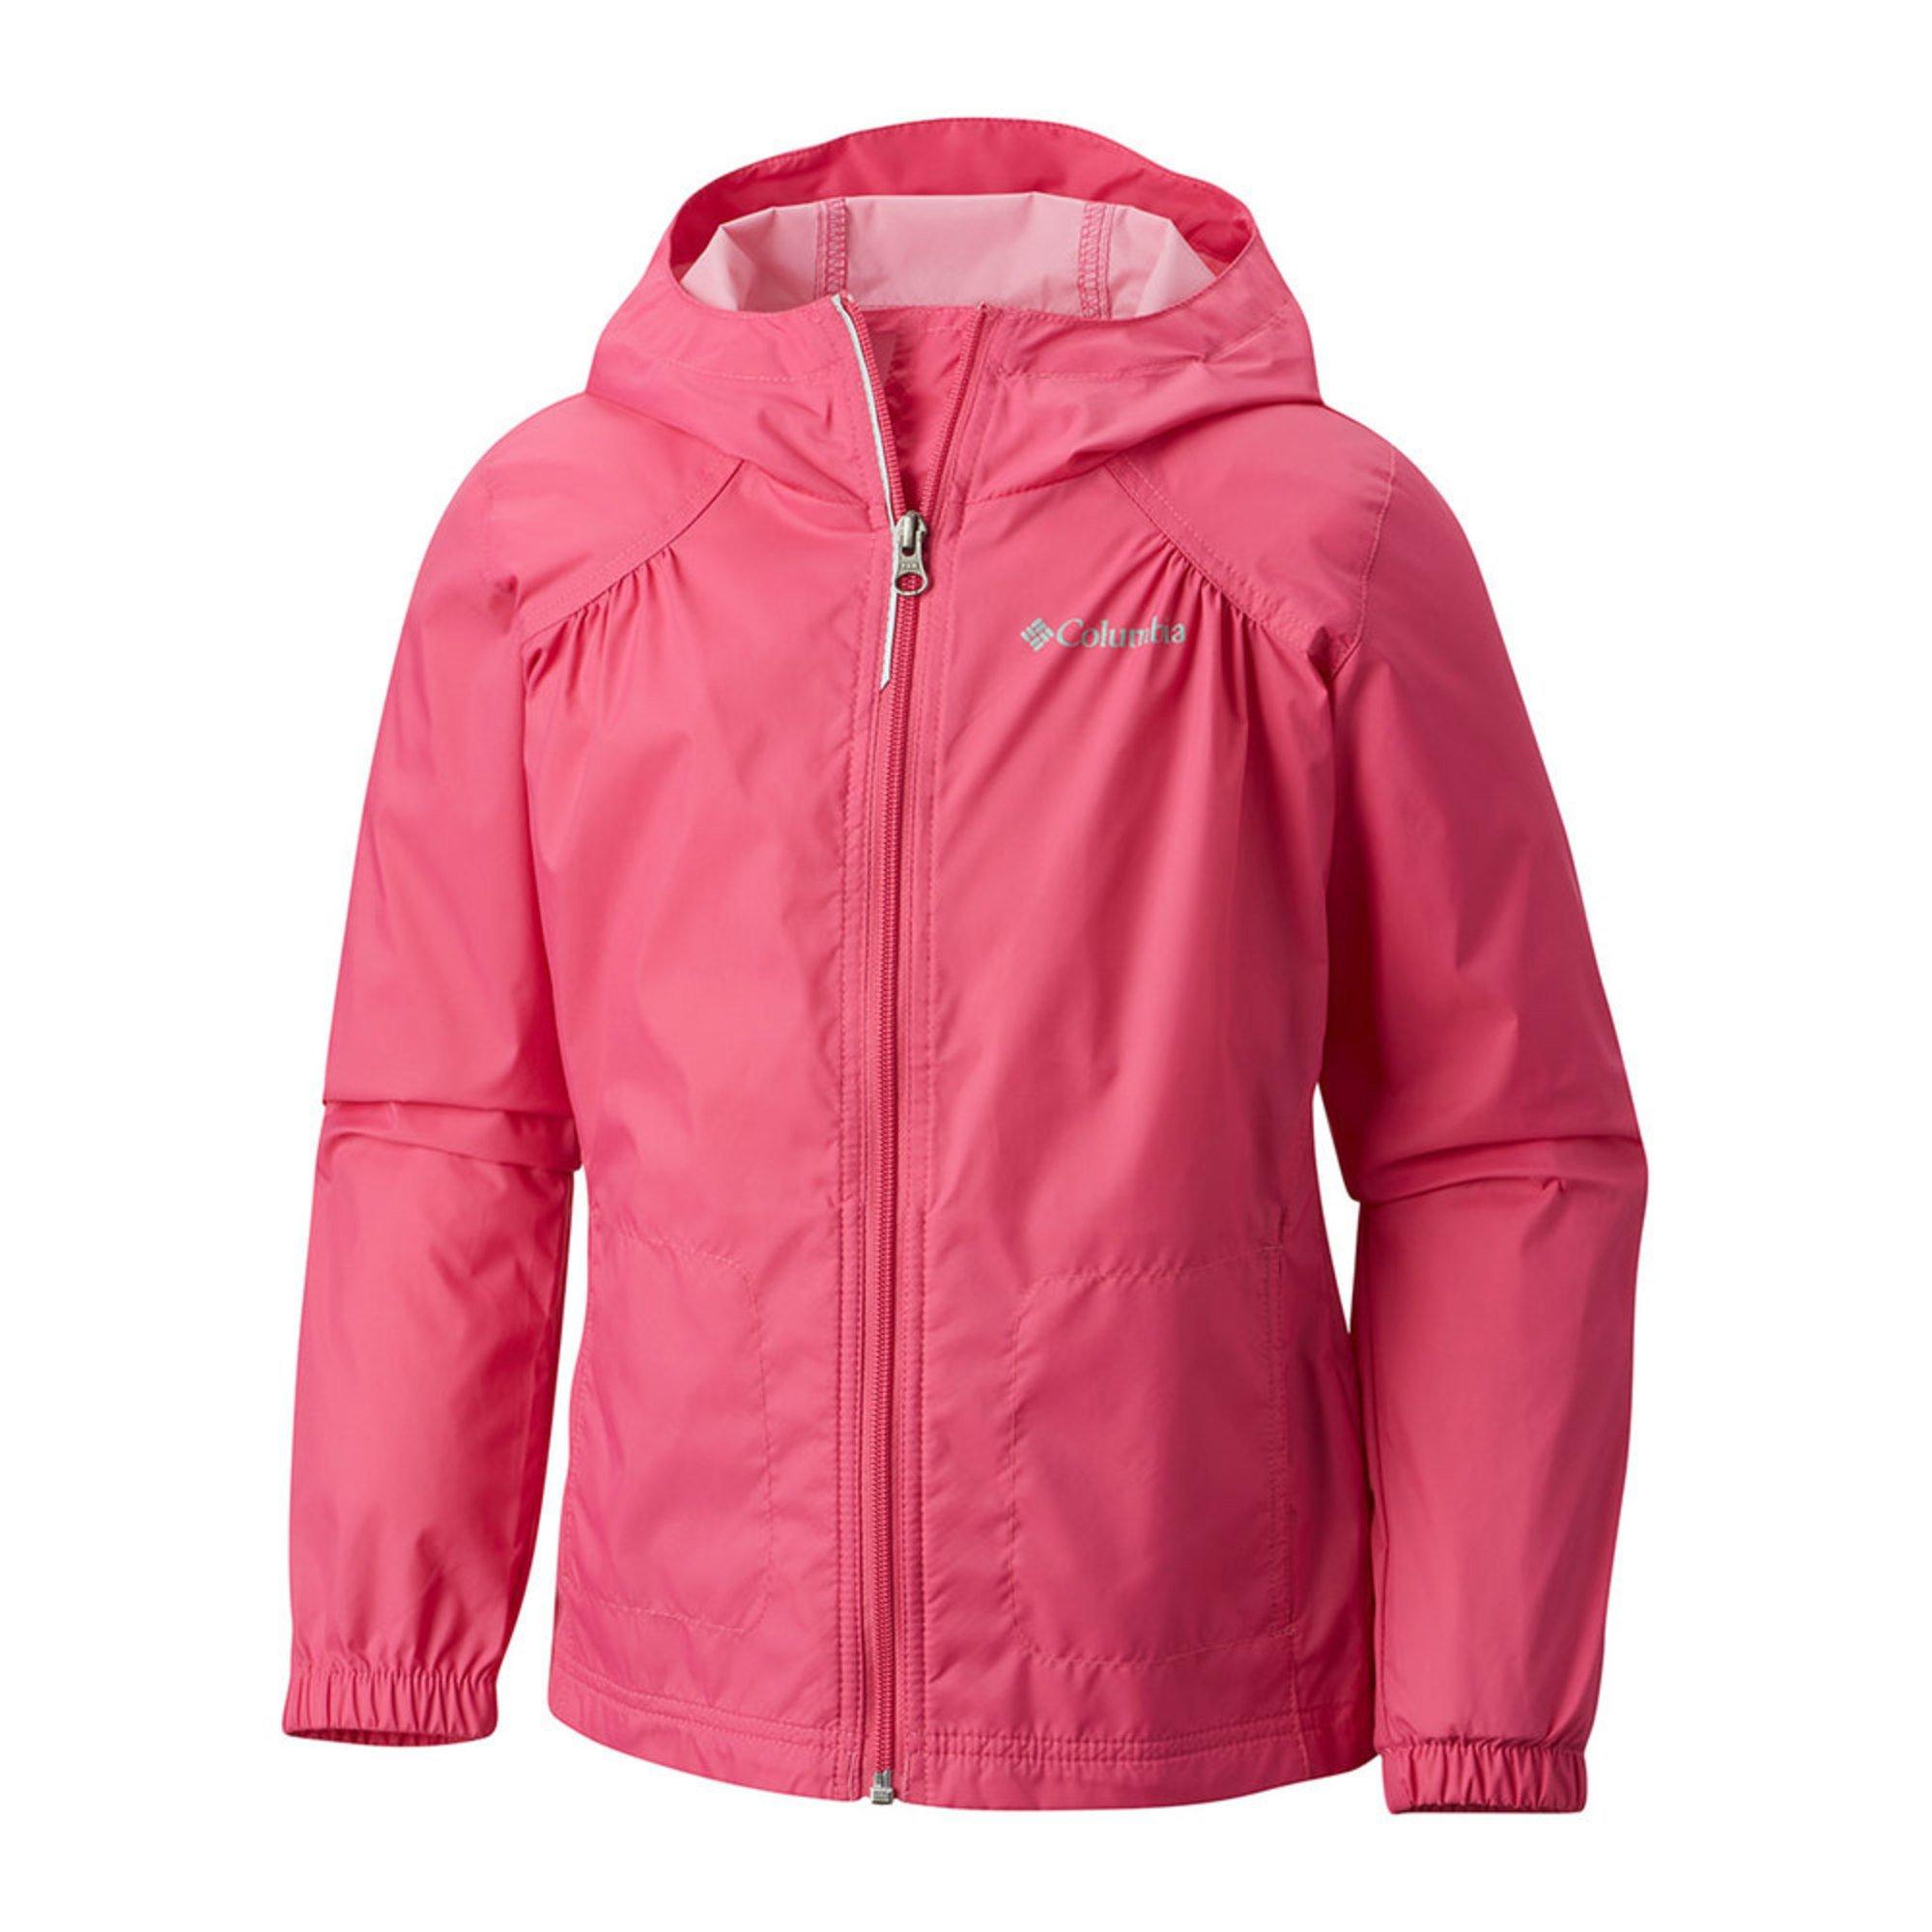 6cfe1db76 Columbia Little Girls' Switch Back Rain Jacket, Pink Ice   Little ...